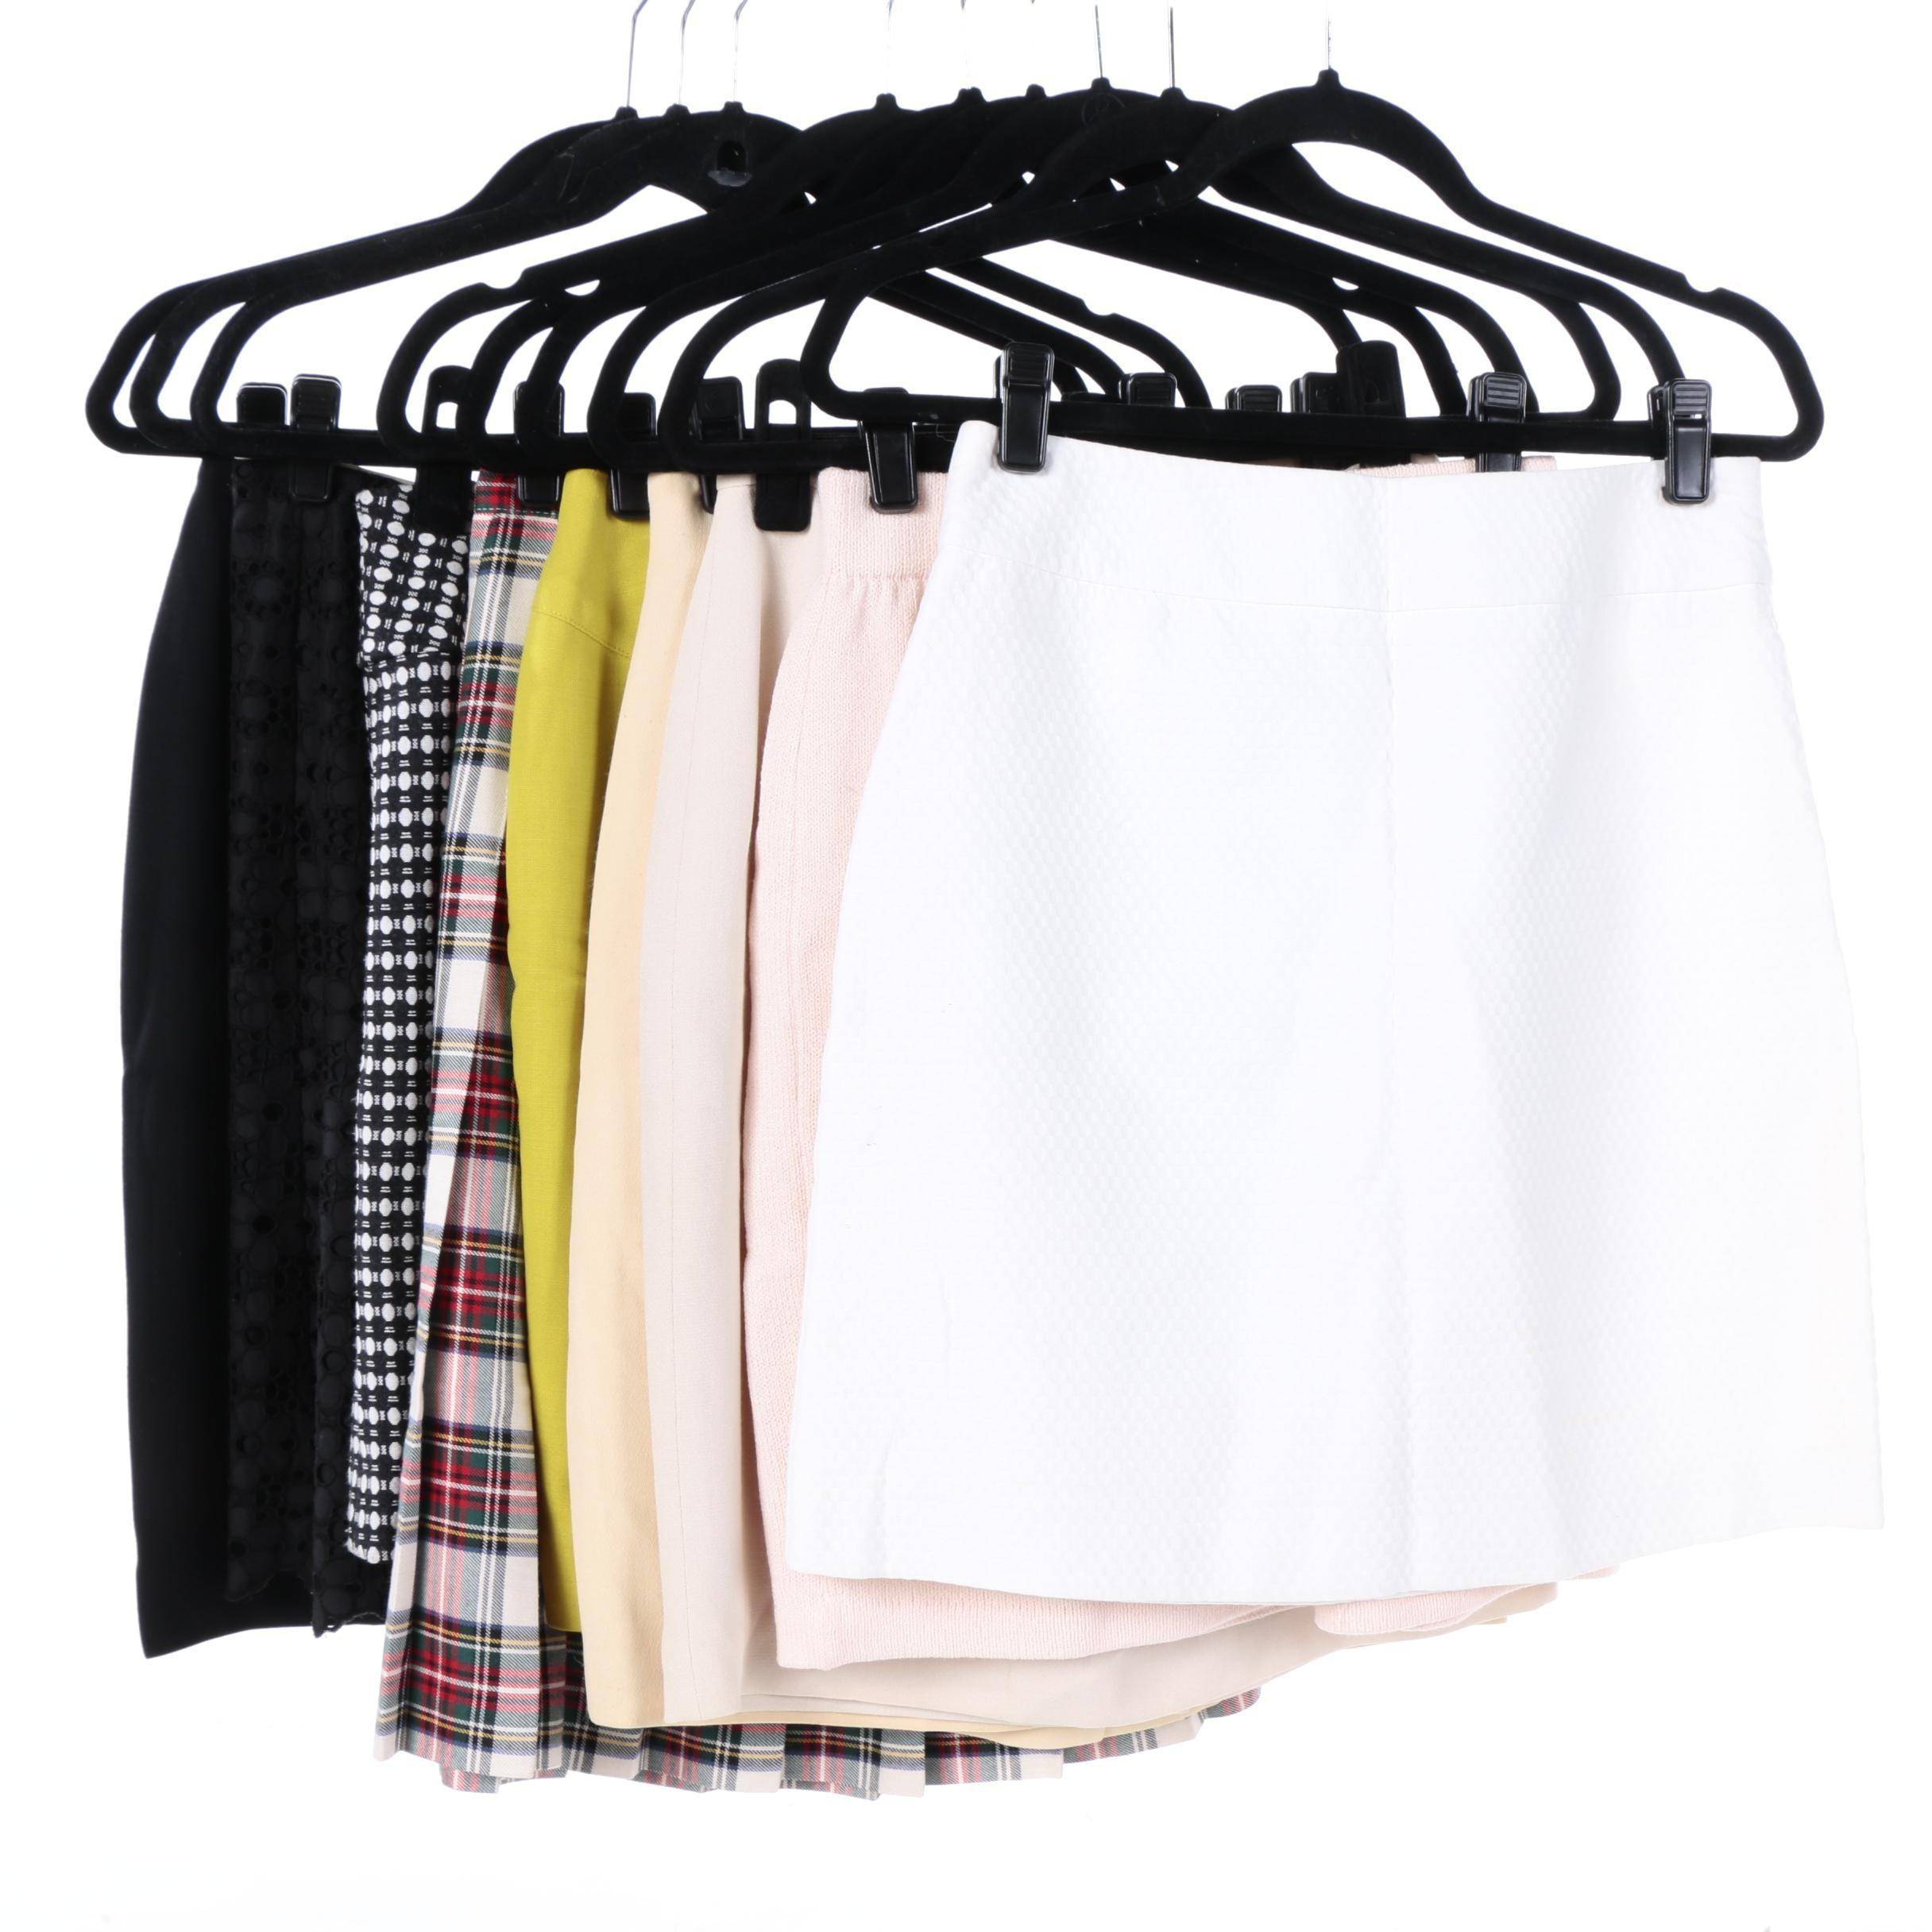 Women's Skirts Including St. John Collection, Giuseppe and SoCa St. John